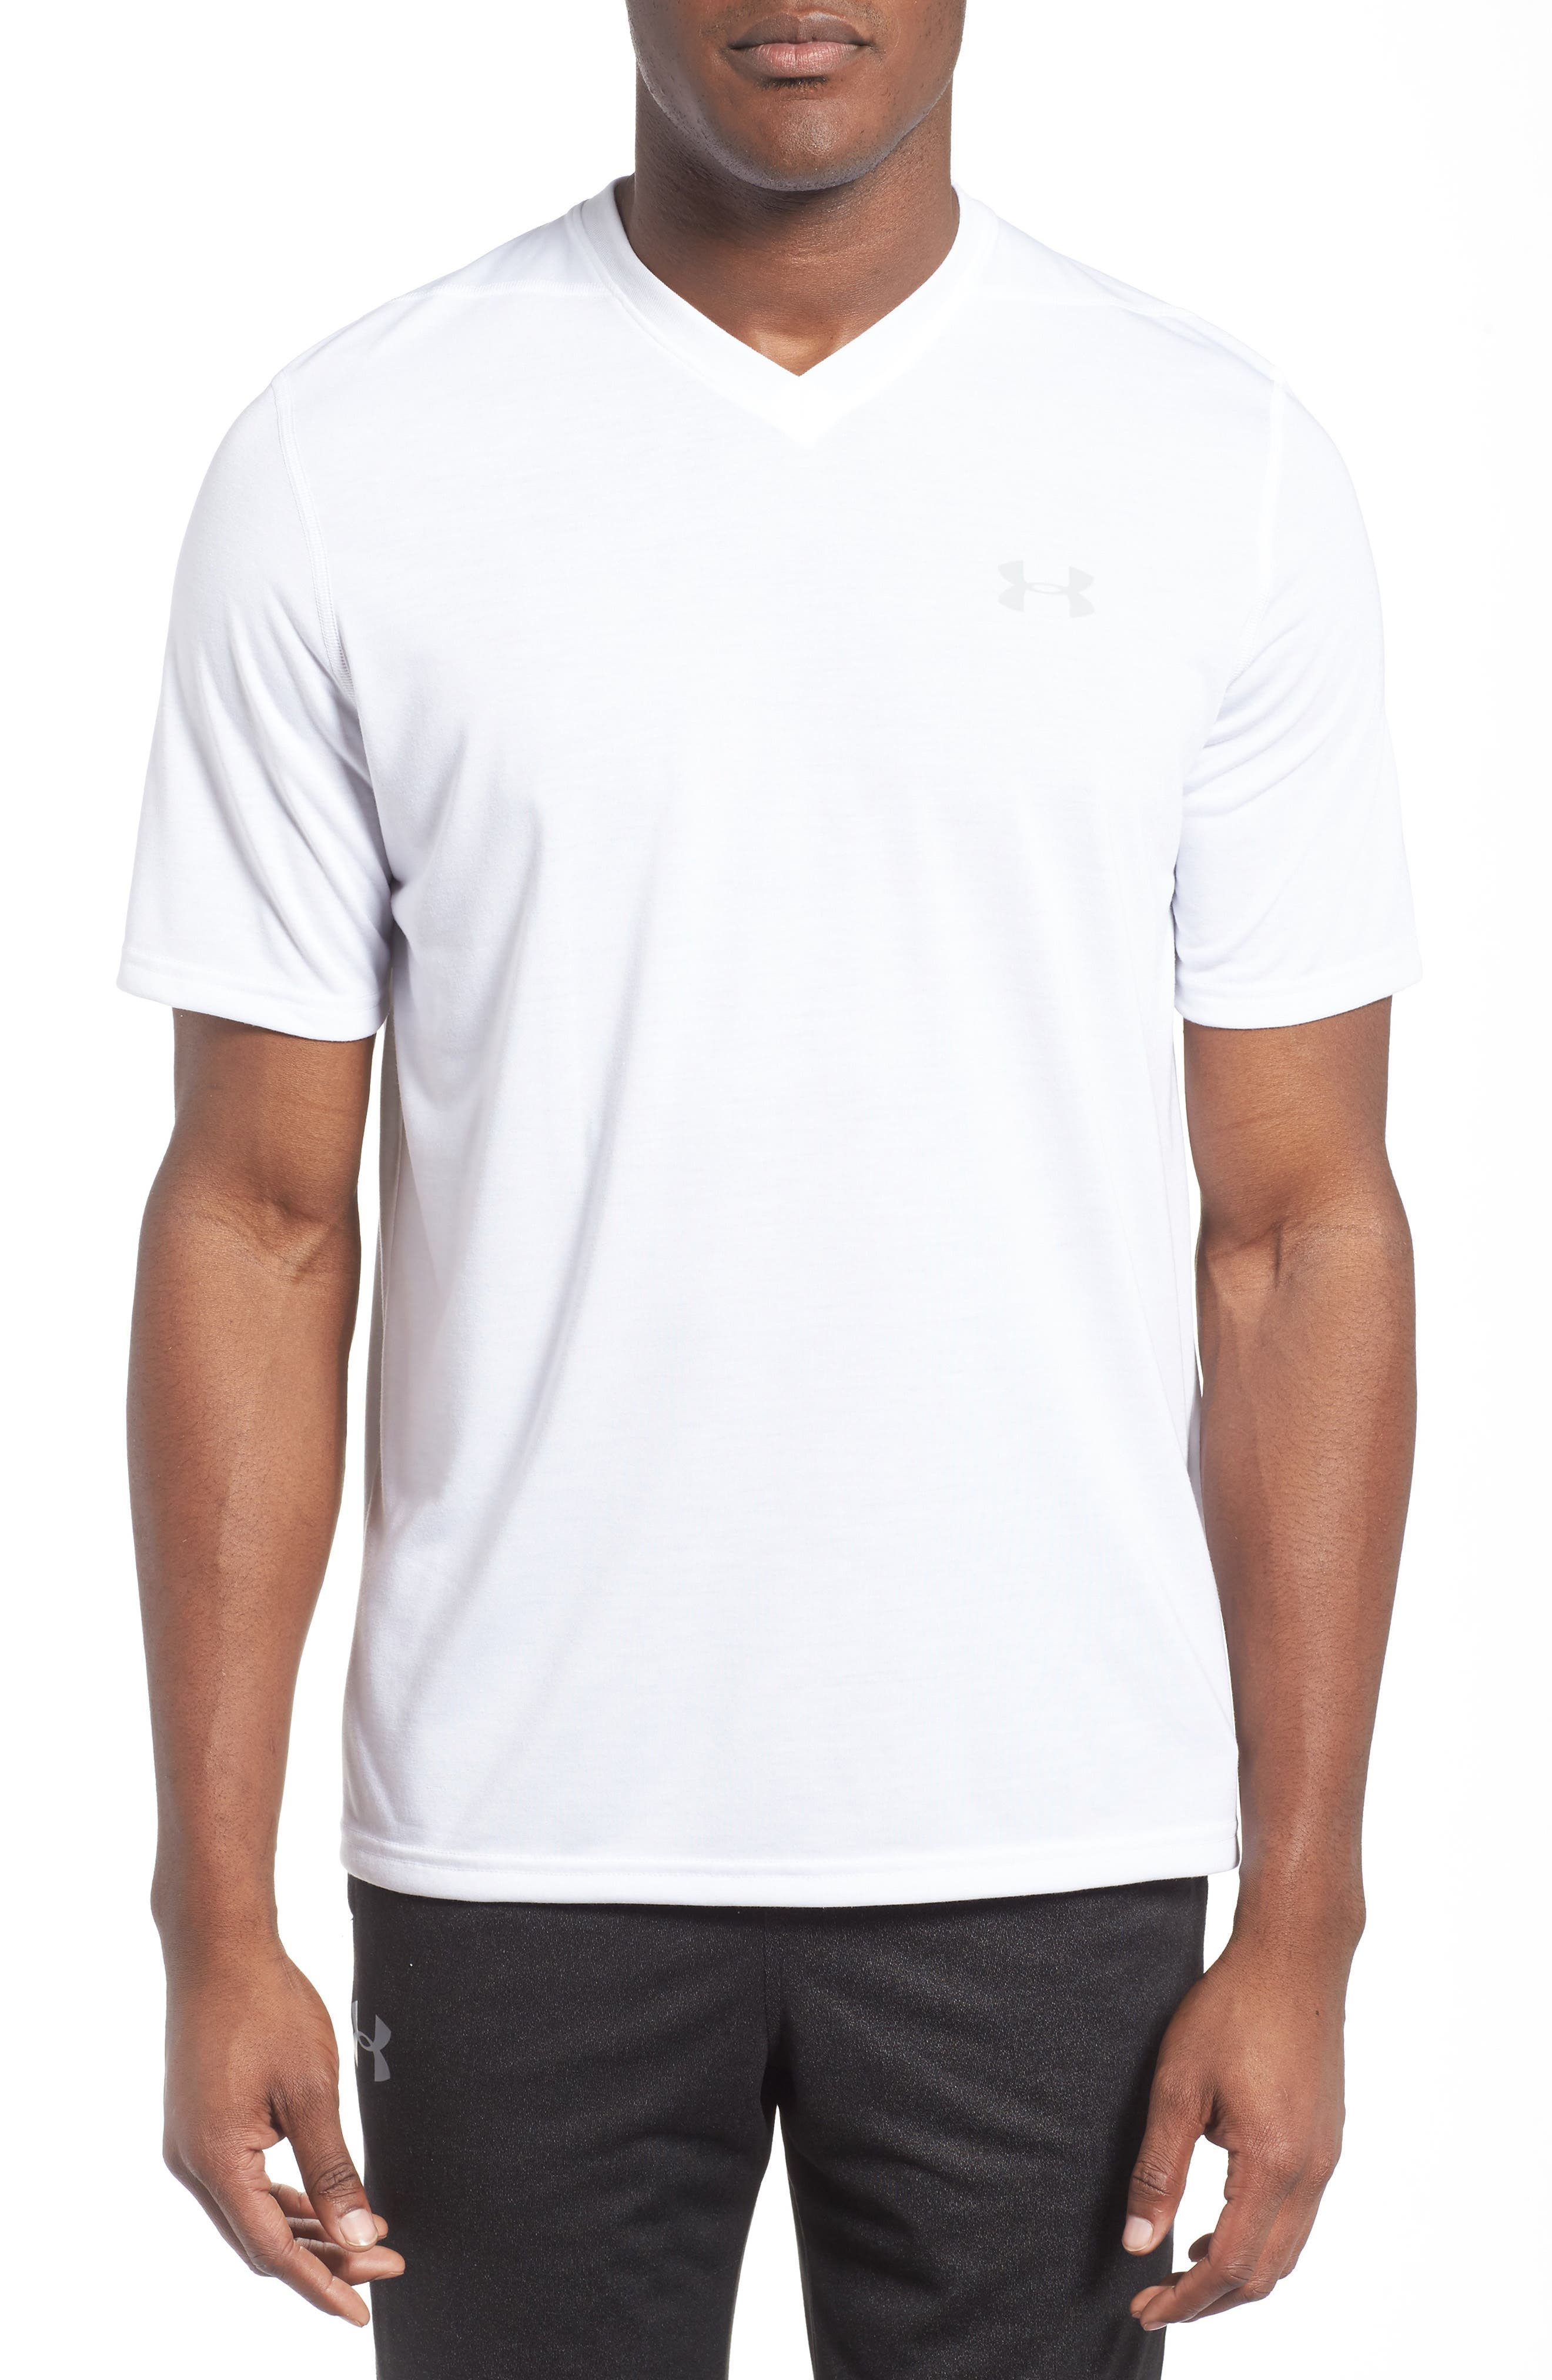 Alternate Image 1 Selected - Under Armour Regular Fit Threadborne T-Shirt